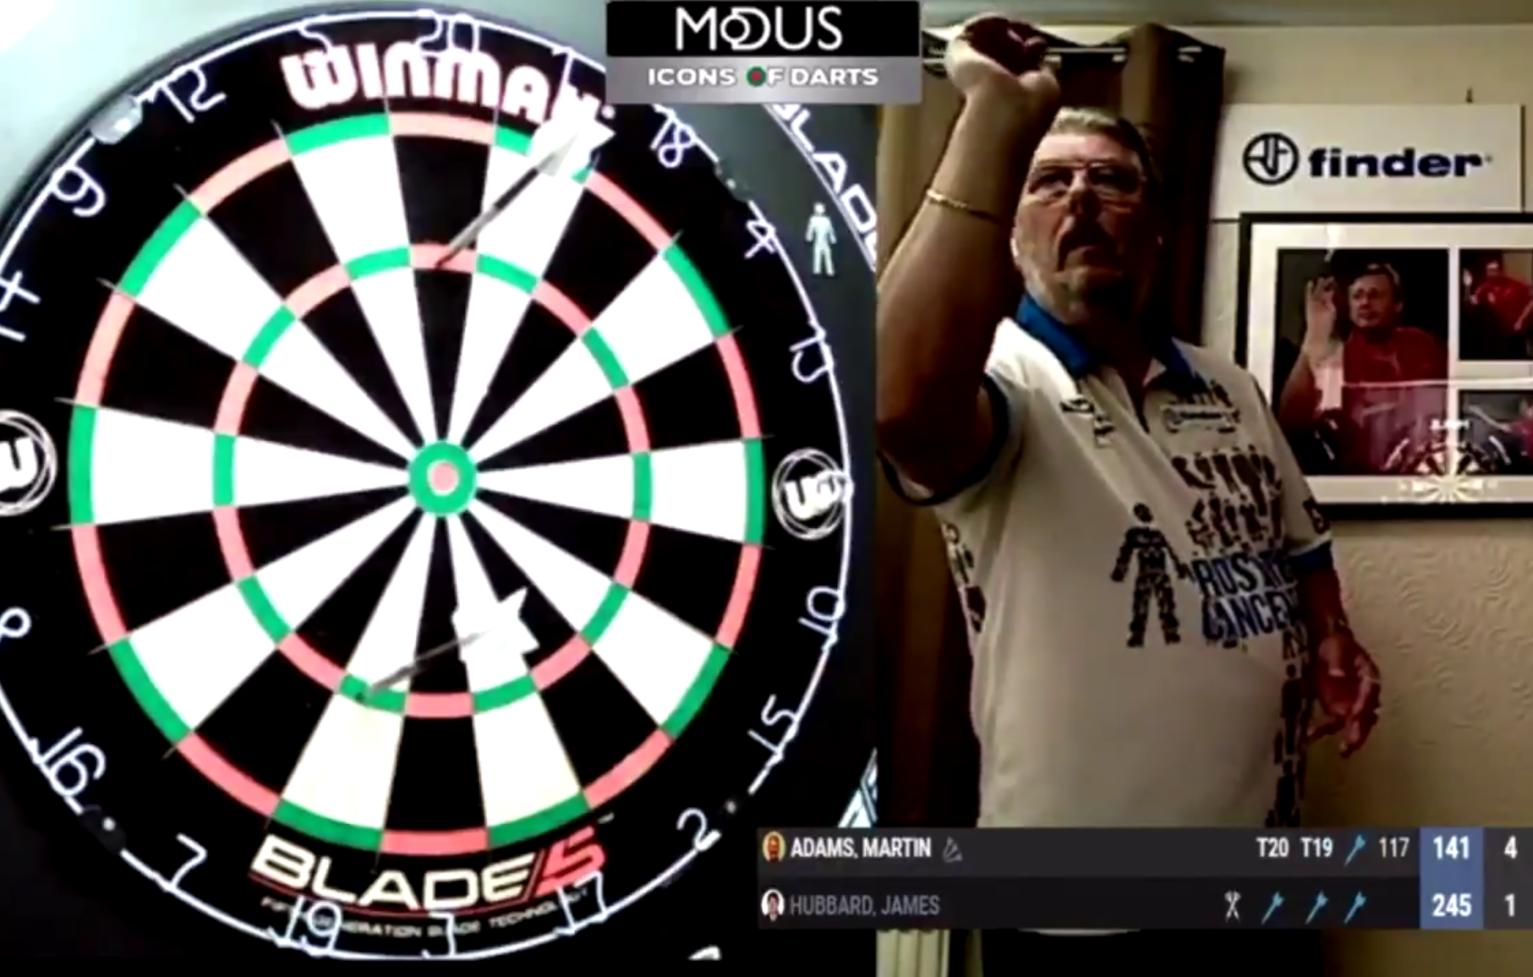 VIDEO: Martin Adams Hits 9-Darter During Icons of Darts 2020